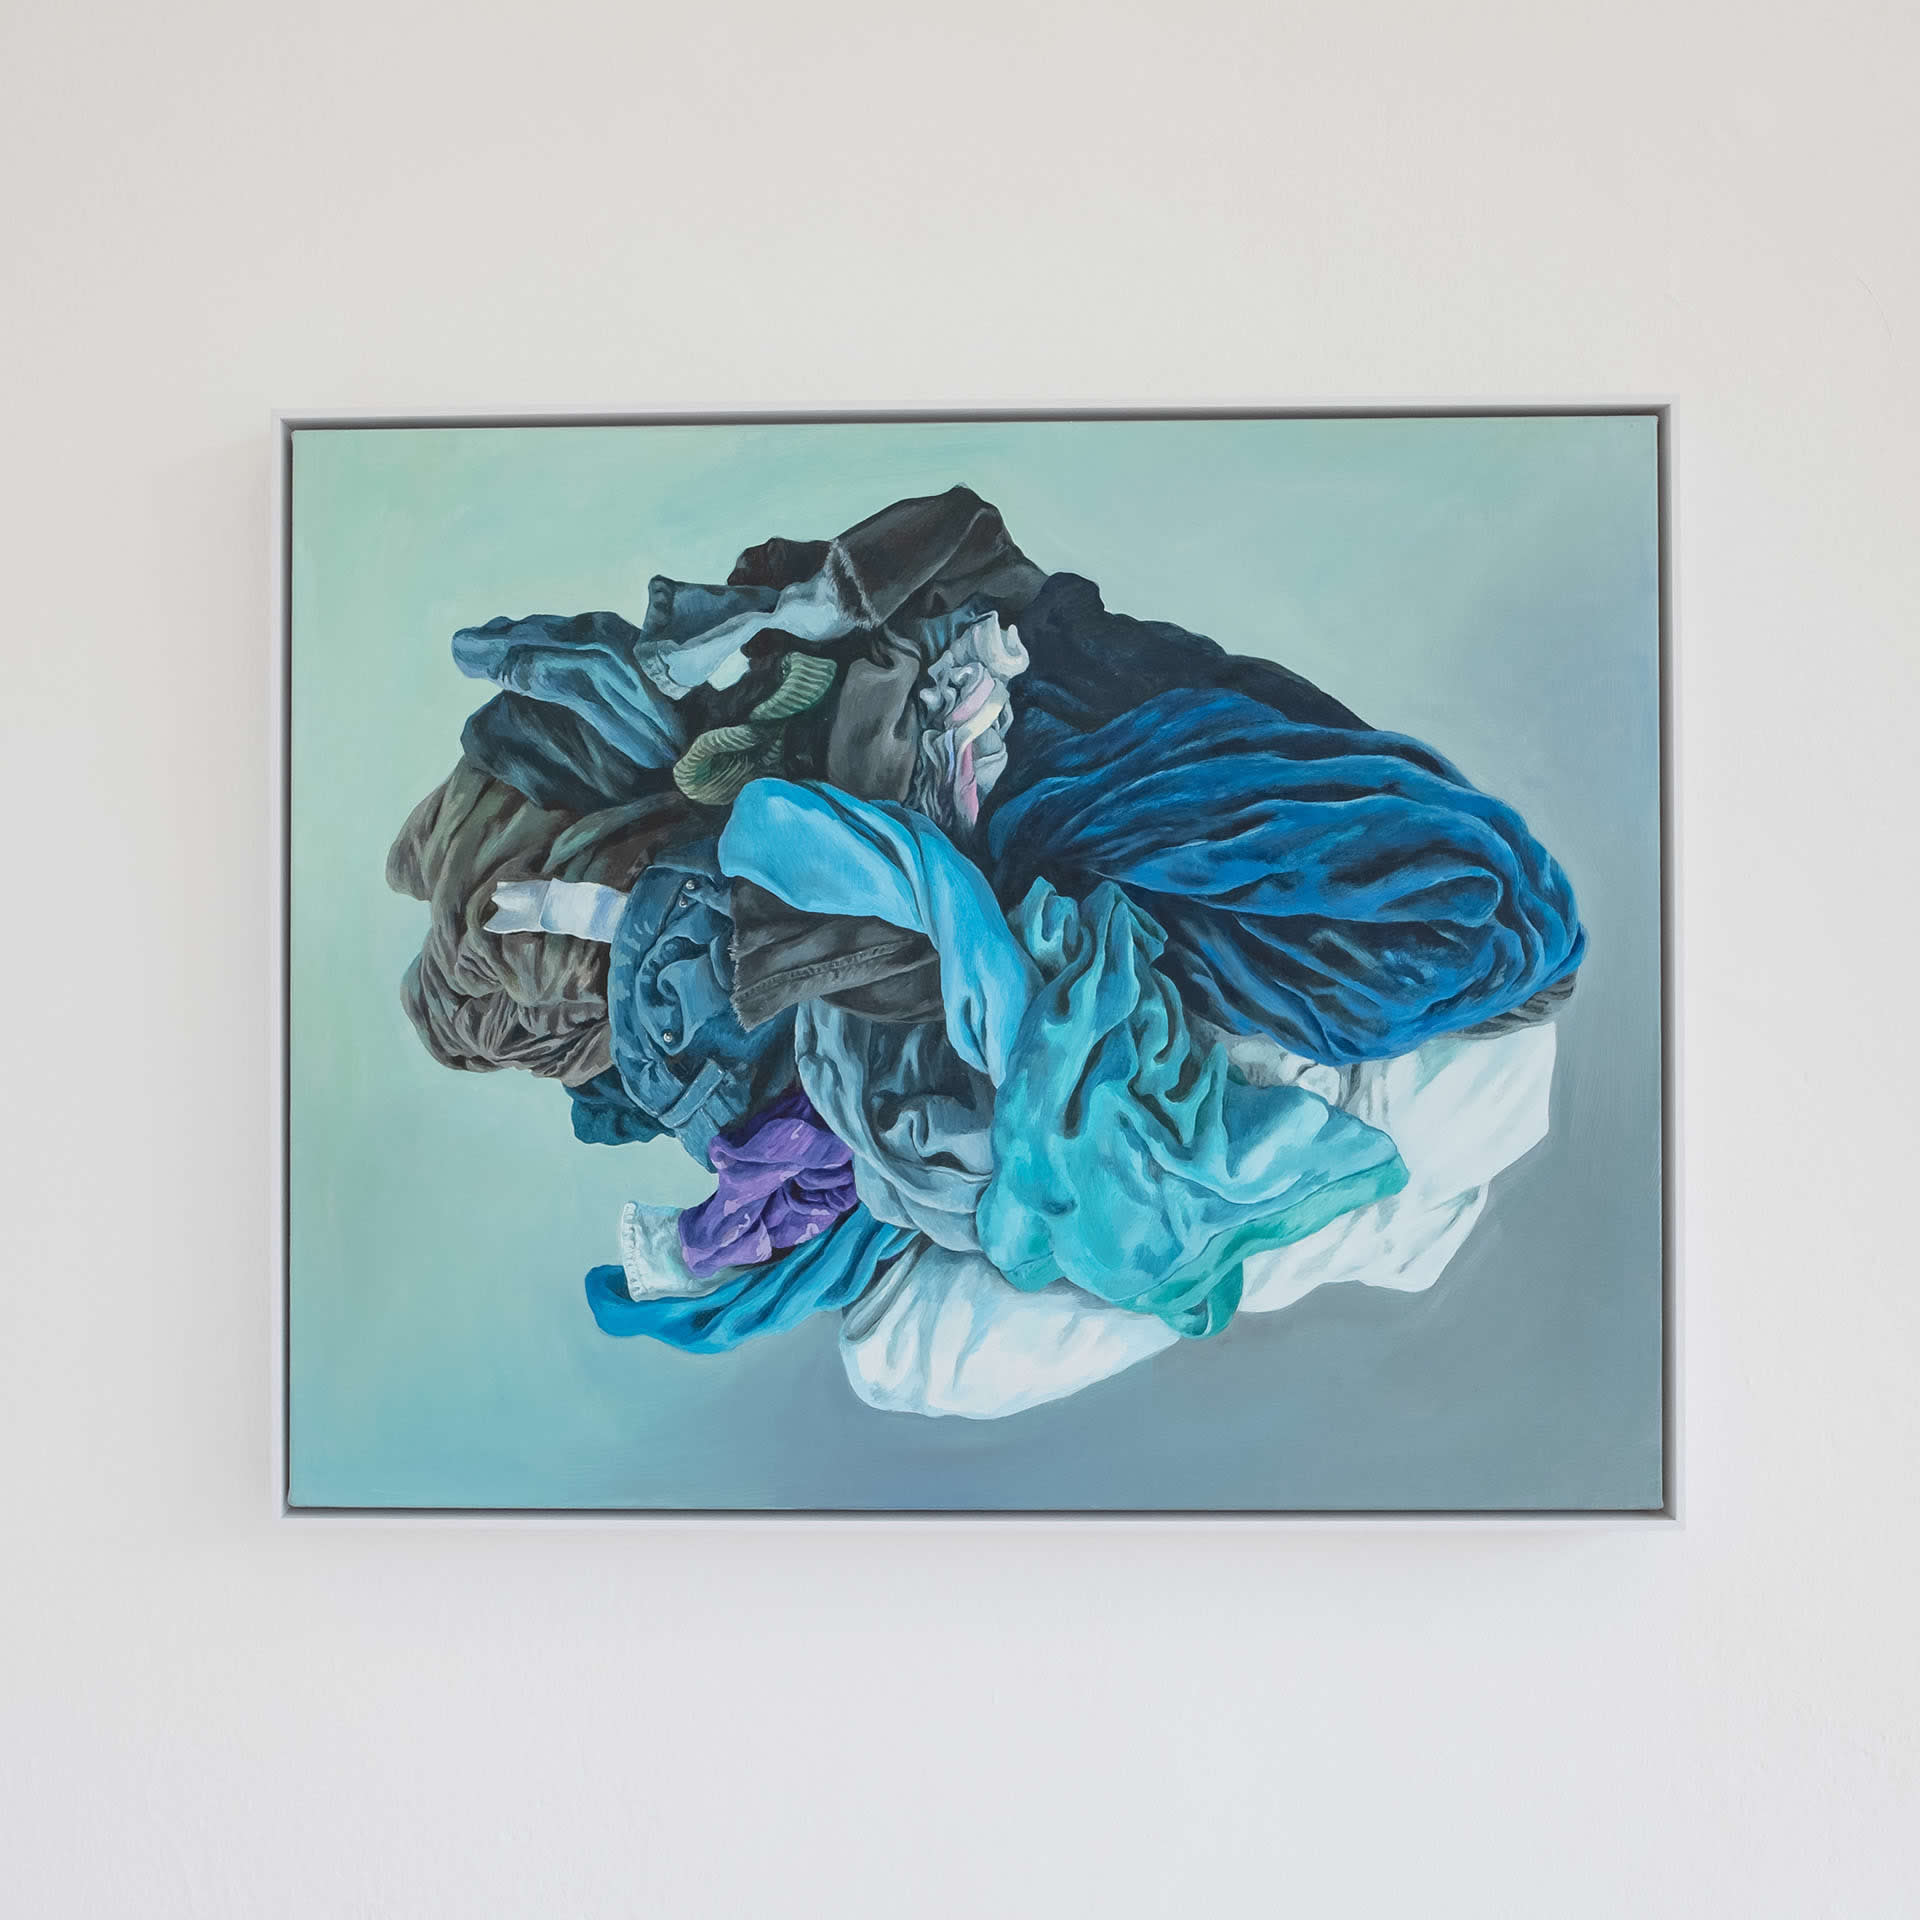 Alina Kunitsyna | Goethe und Schiller | 2020 | Naked Nature | Galerie 3 Velden | Foto Manu Lasnik